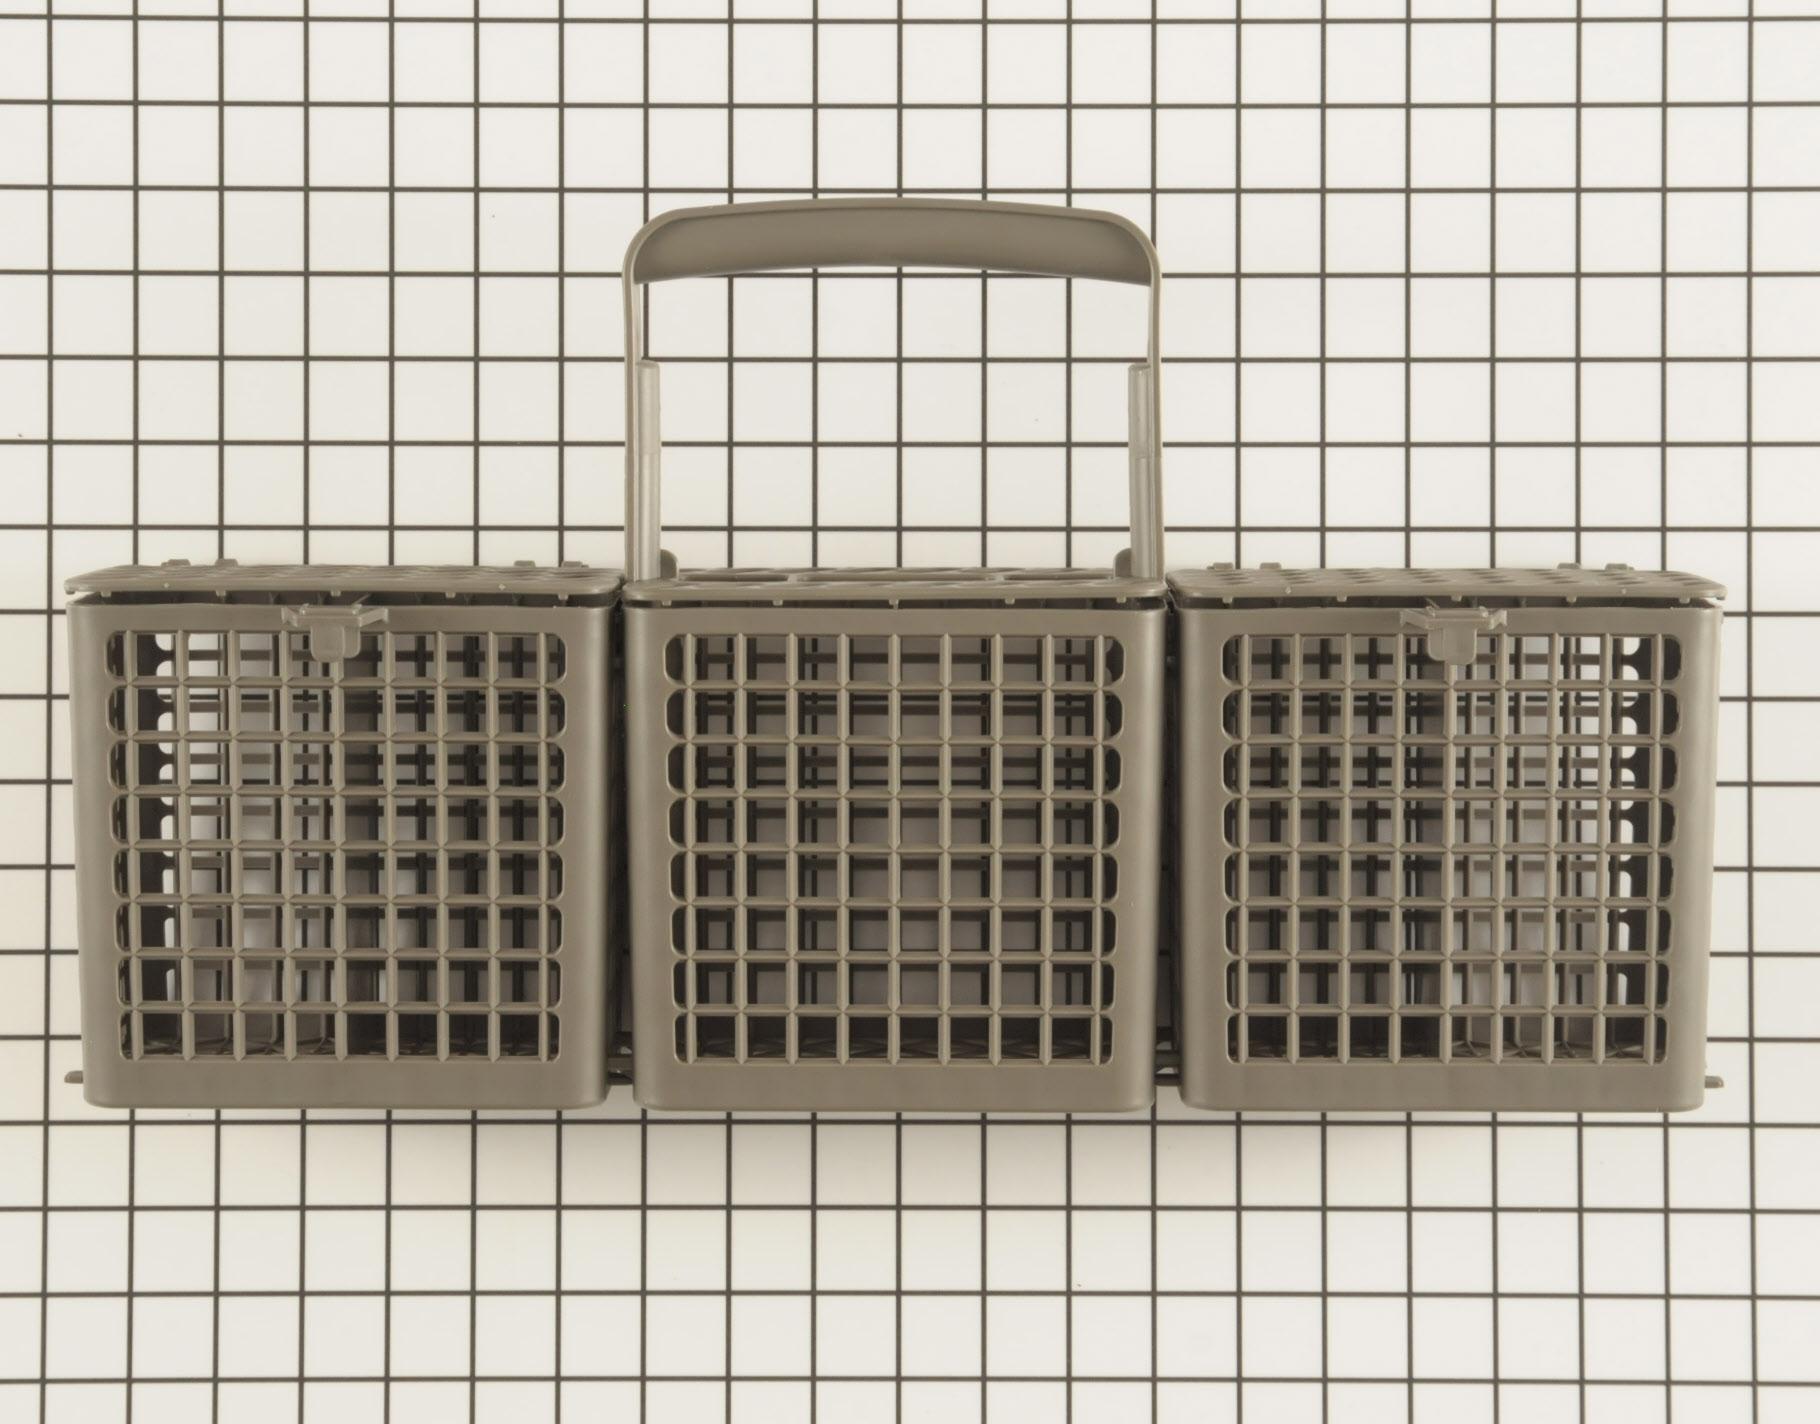 LG Dishwasher Part # 5005DD1001B - Silverware Basket